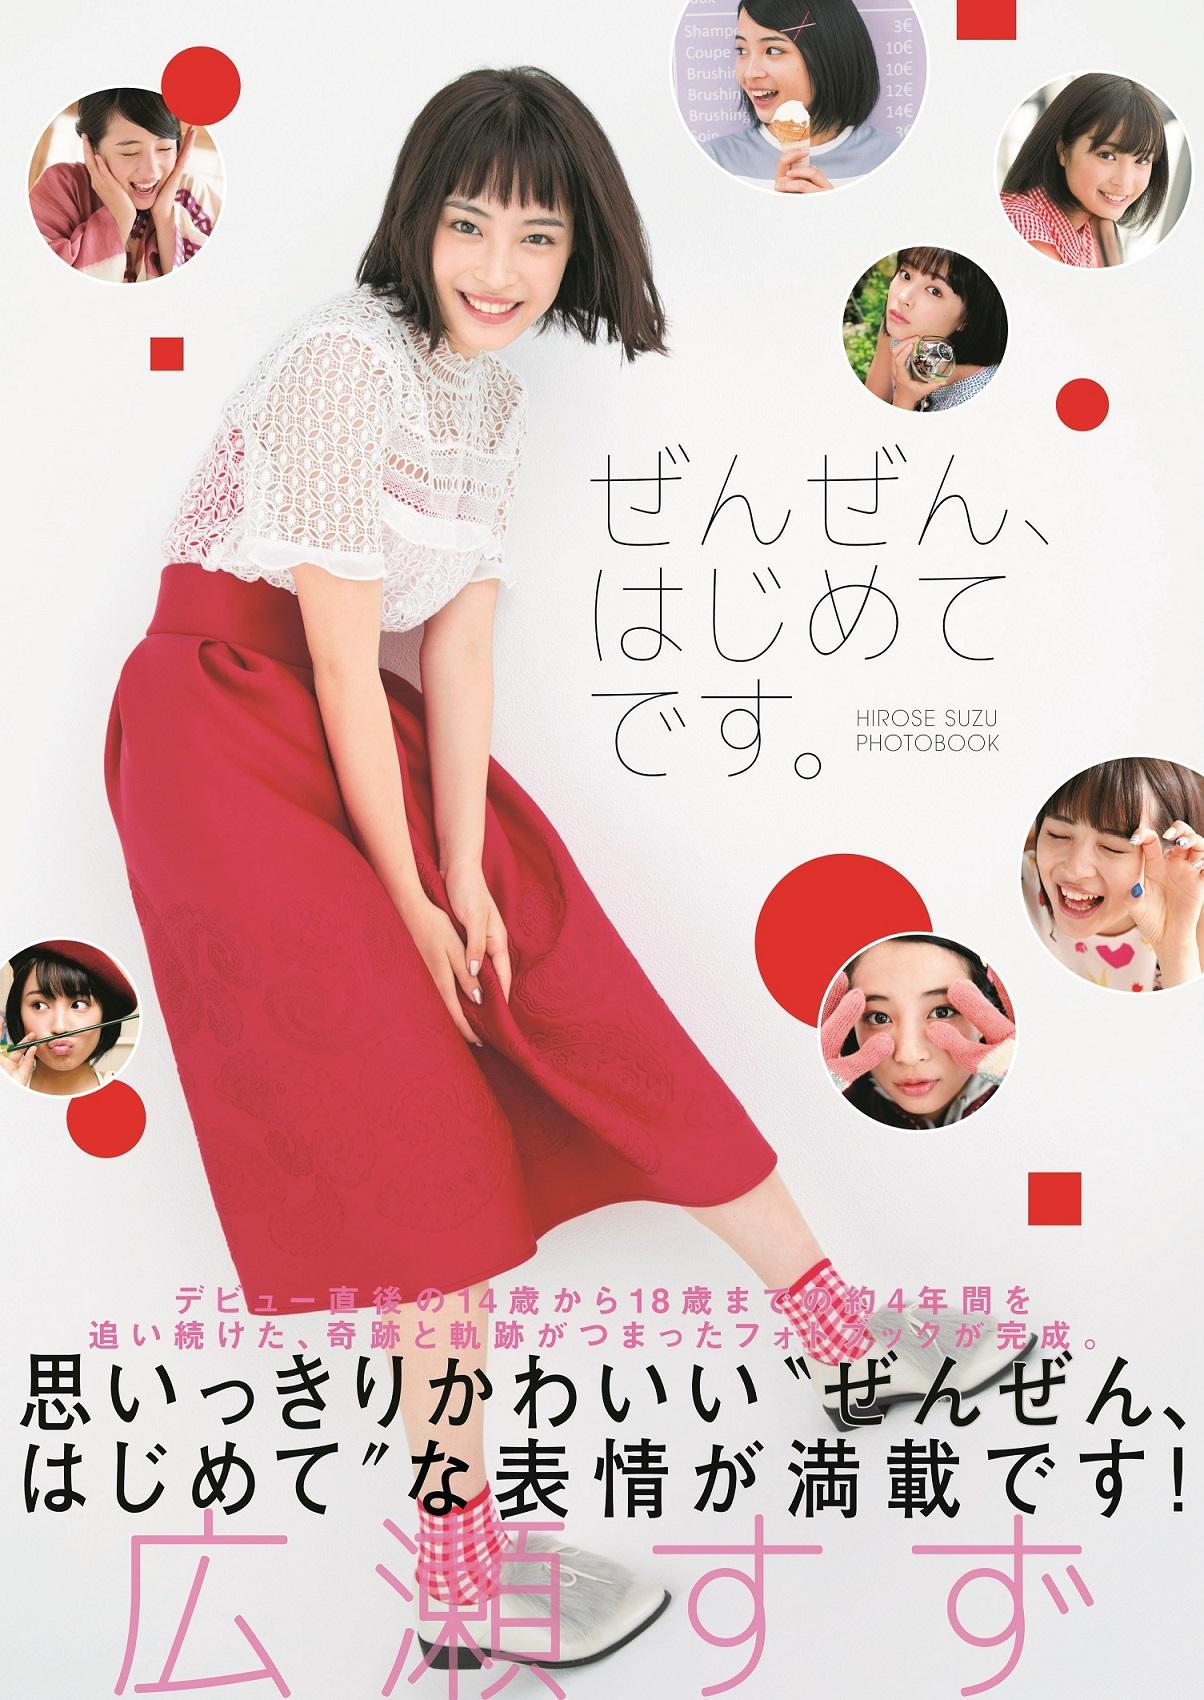 20161006_hirosesuzu1_cover_toukou